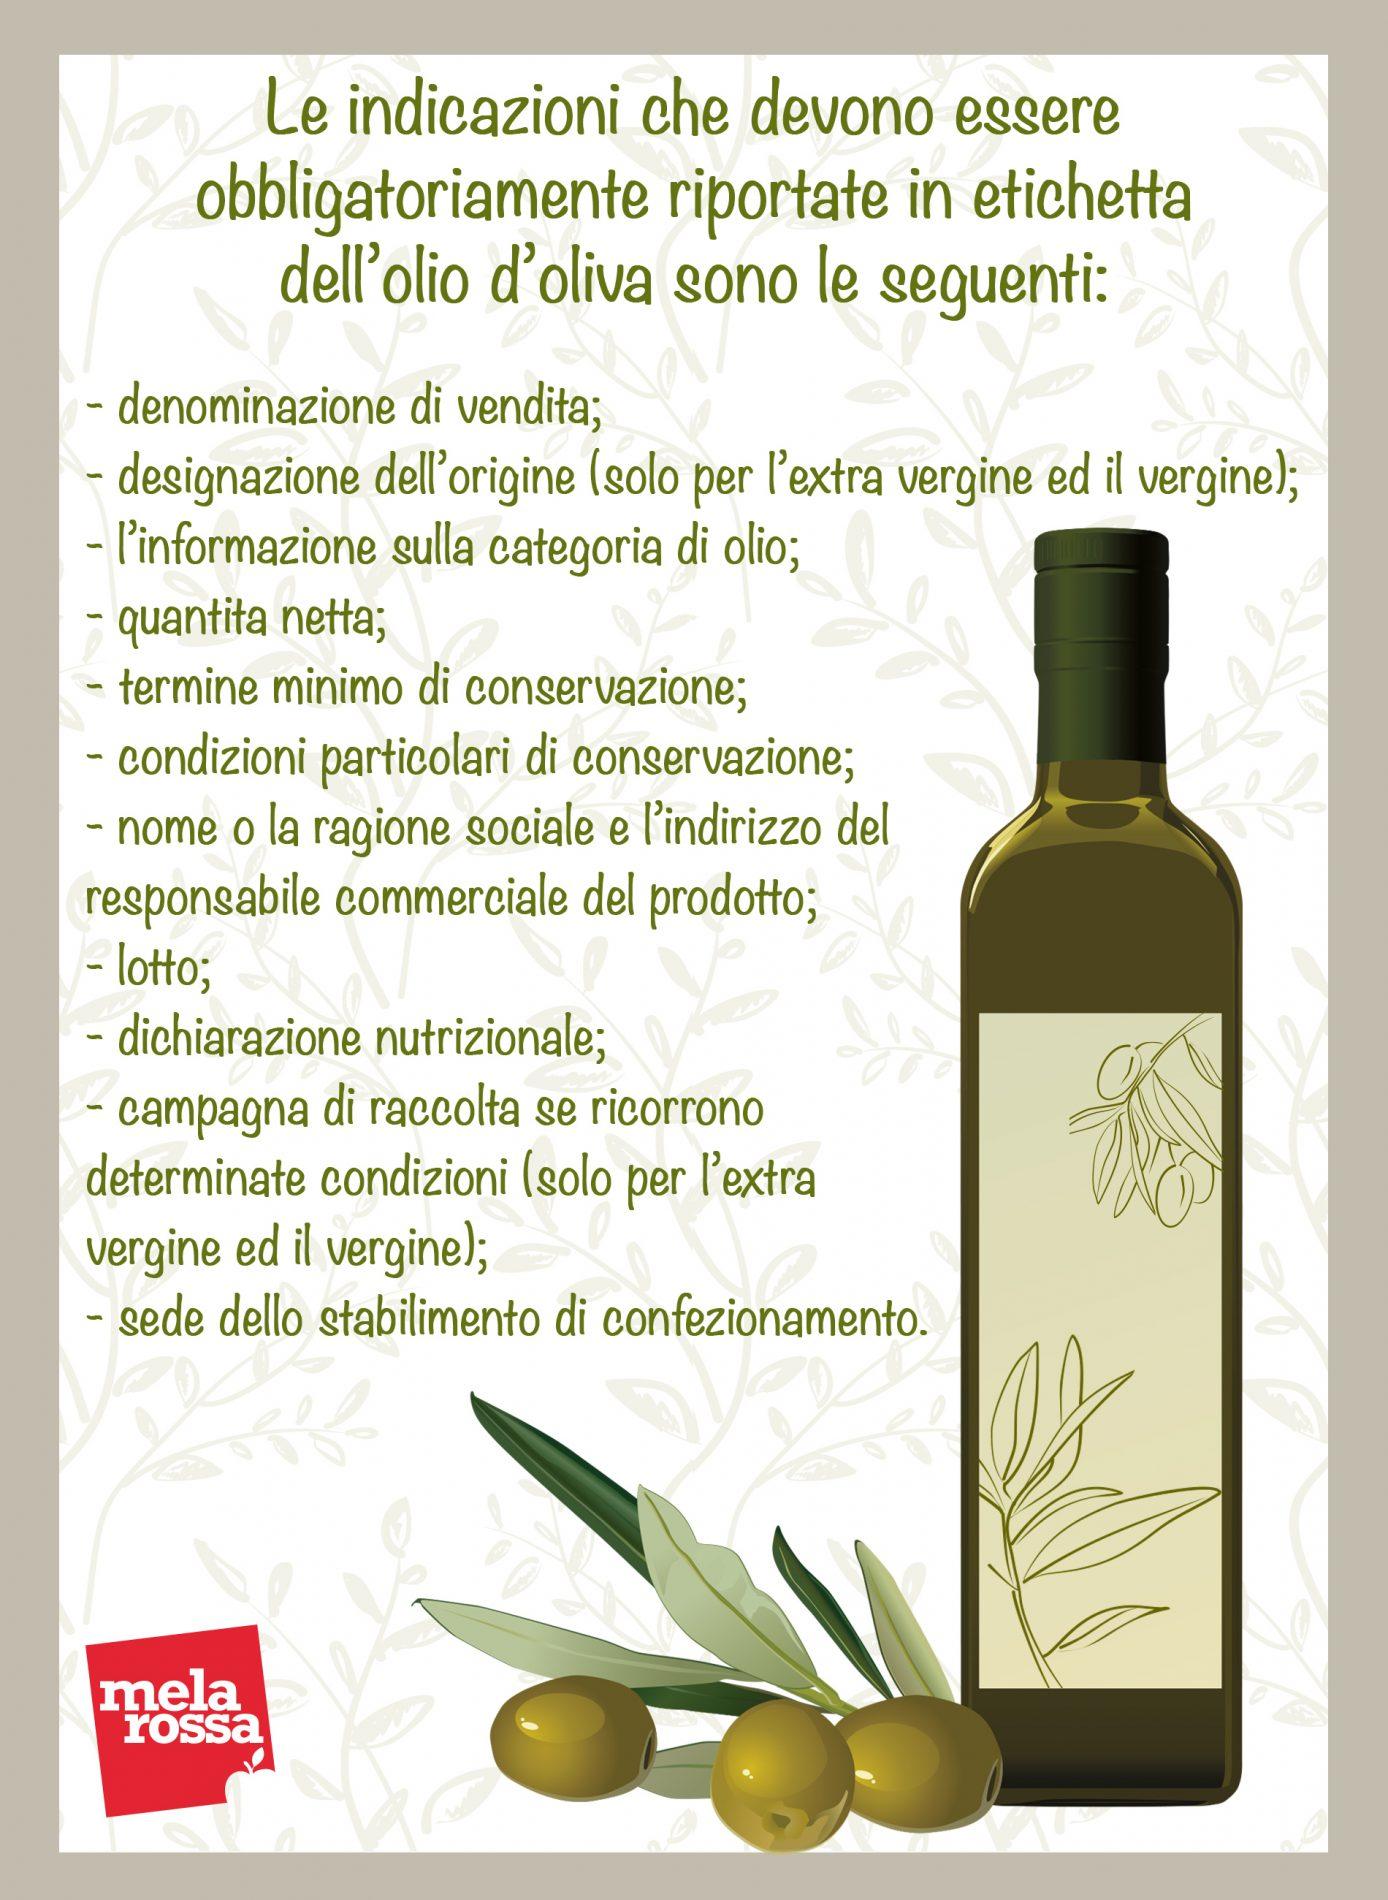 aceite de oliva: etiquetado